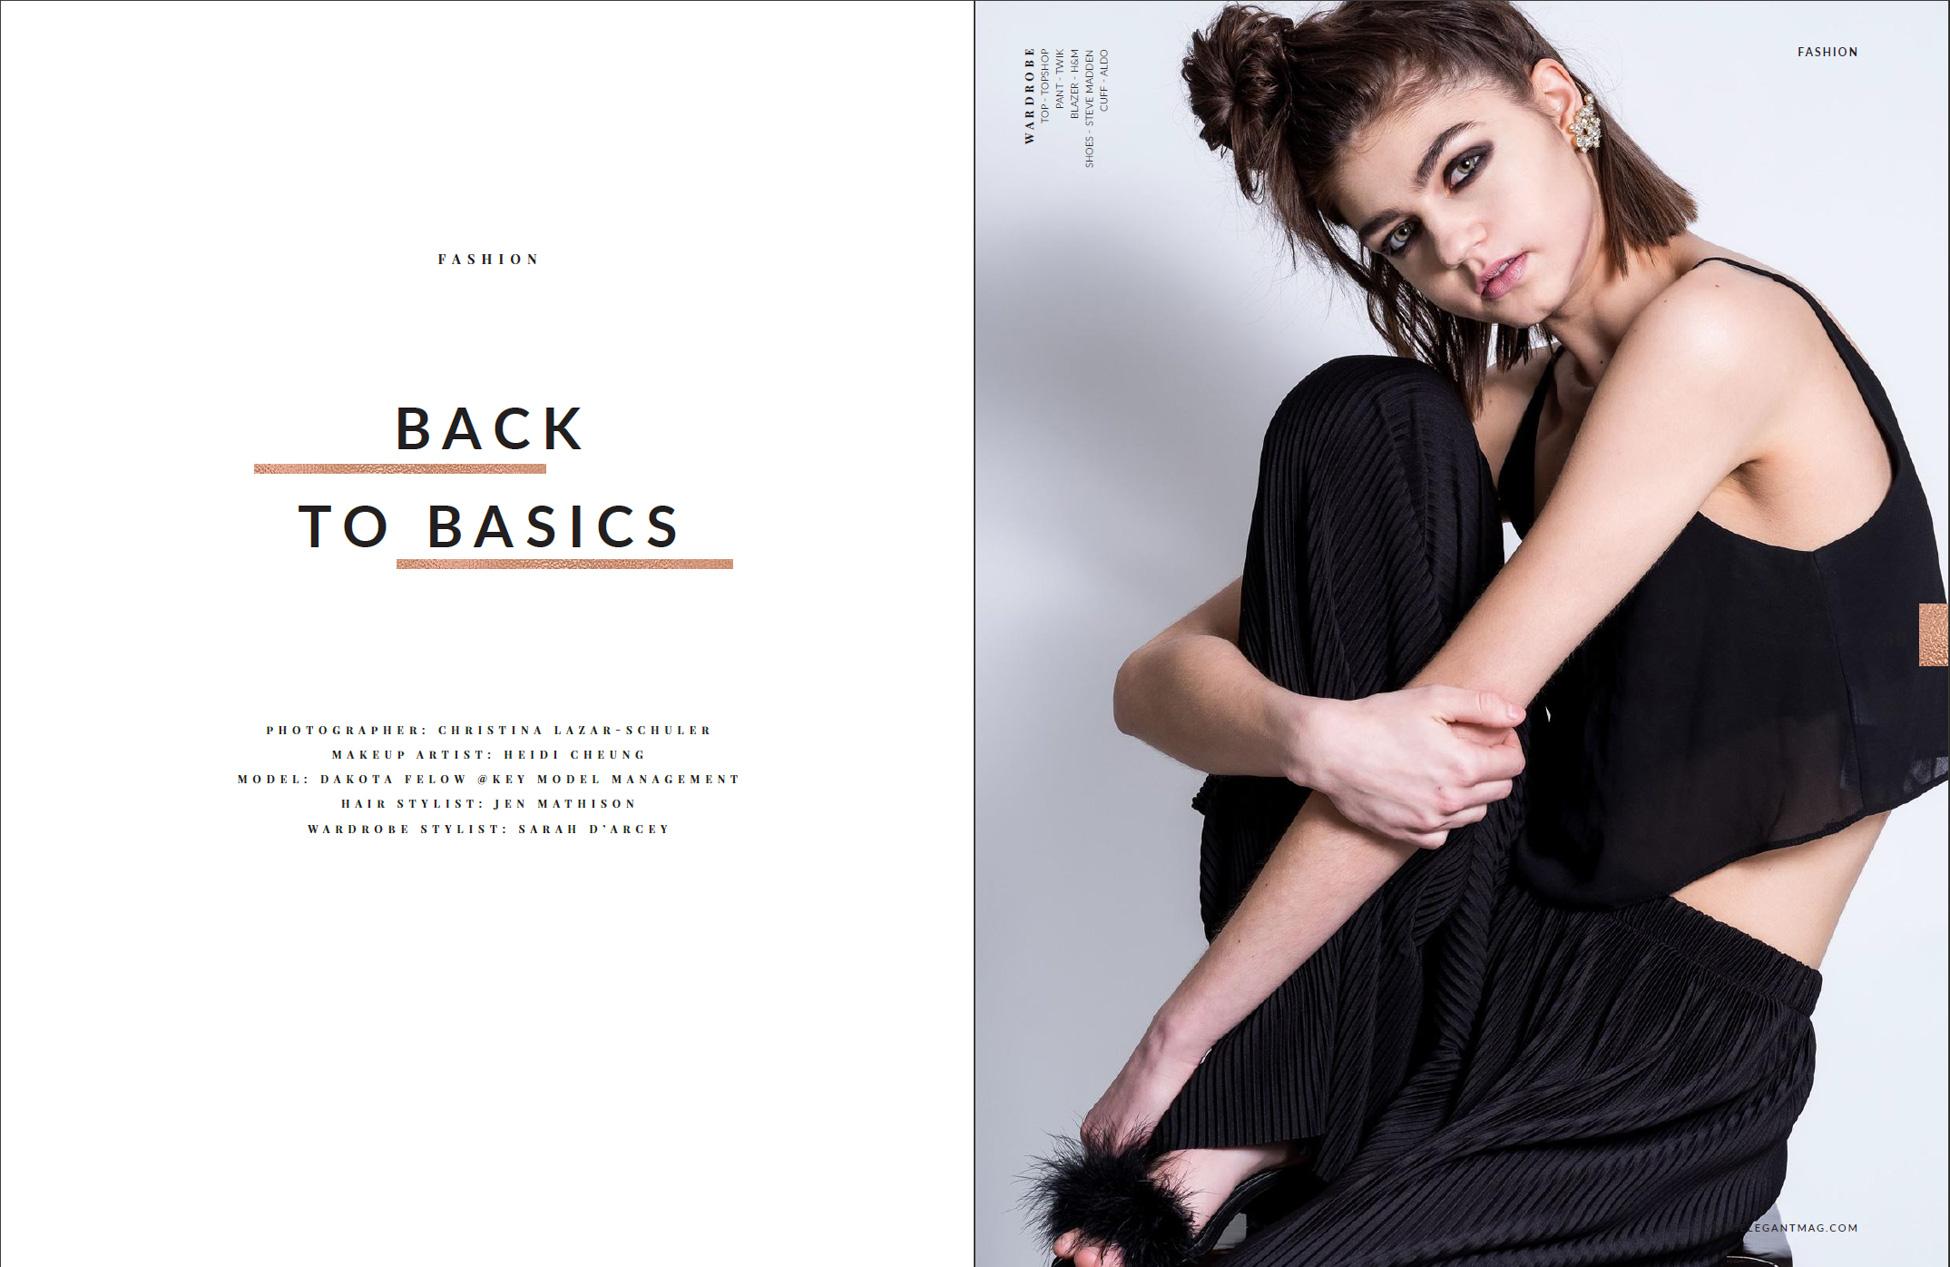 backtobasics---dakota_44388819431_o.jpg